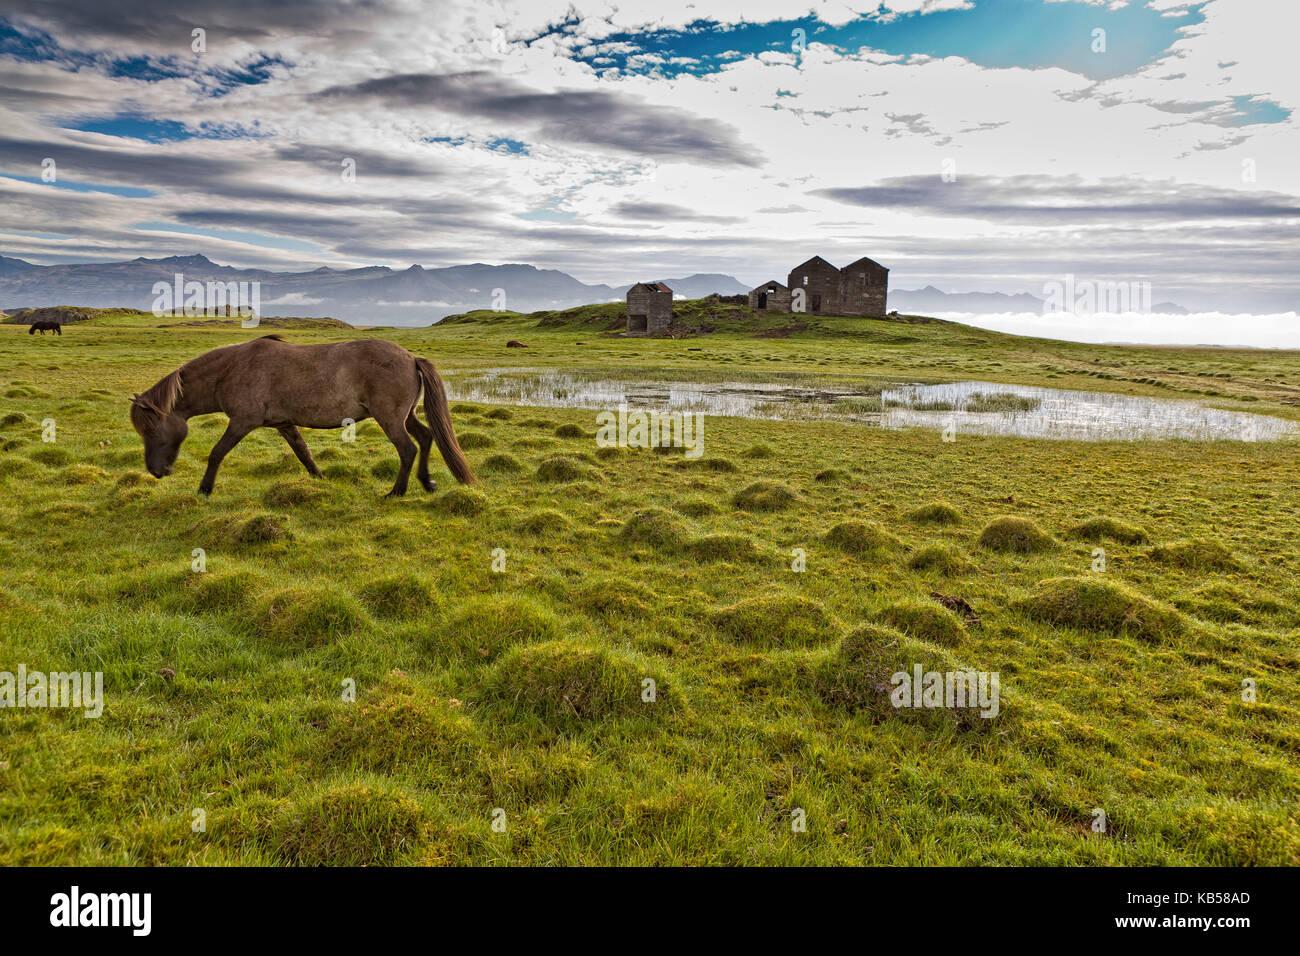 Horse grazing by Vidbordssel- abandon farm, Hornafjordur, Iceland - Stock Image